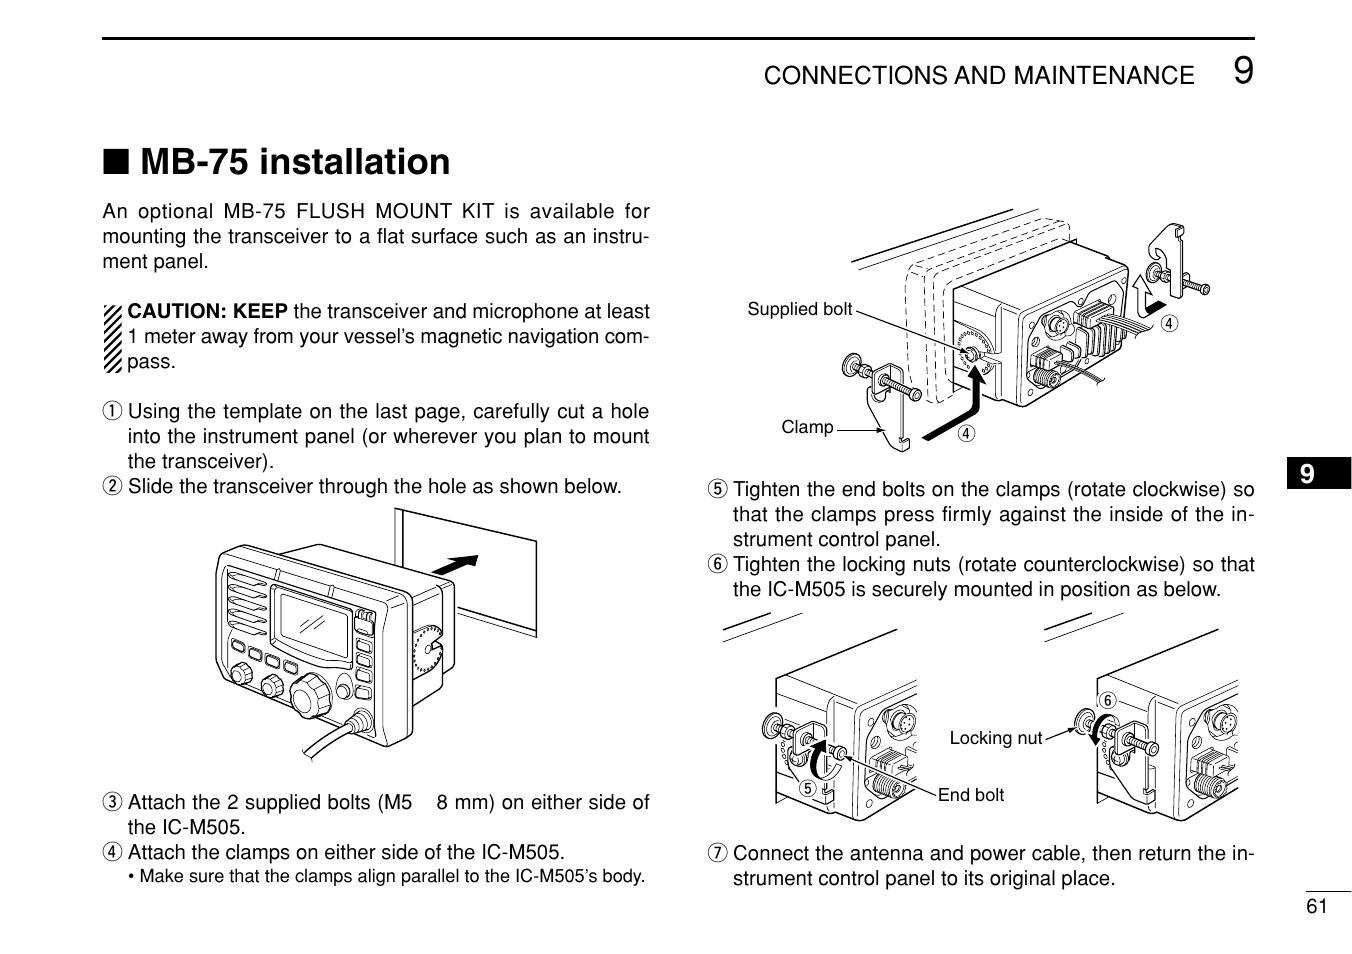 mb 75 installation icom ic m505 user manual page 67 80 rh manualsdir com icom ic-m505 service manual icom ic-m505 manuel